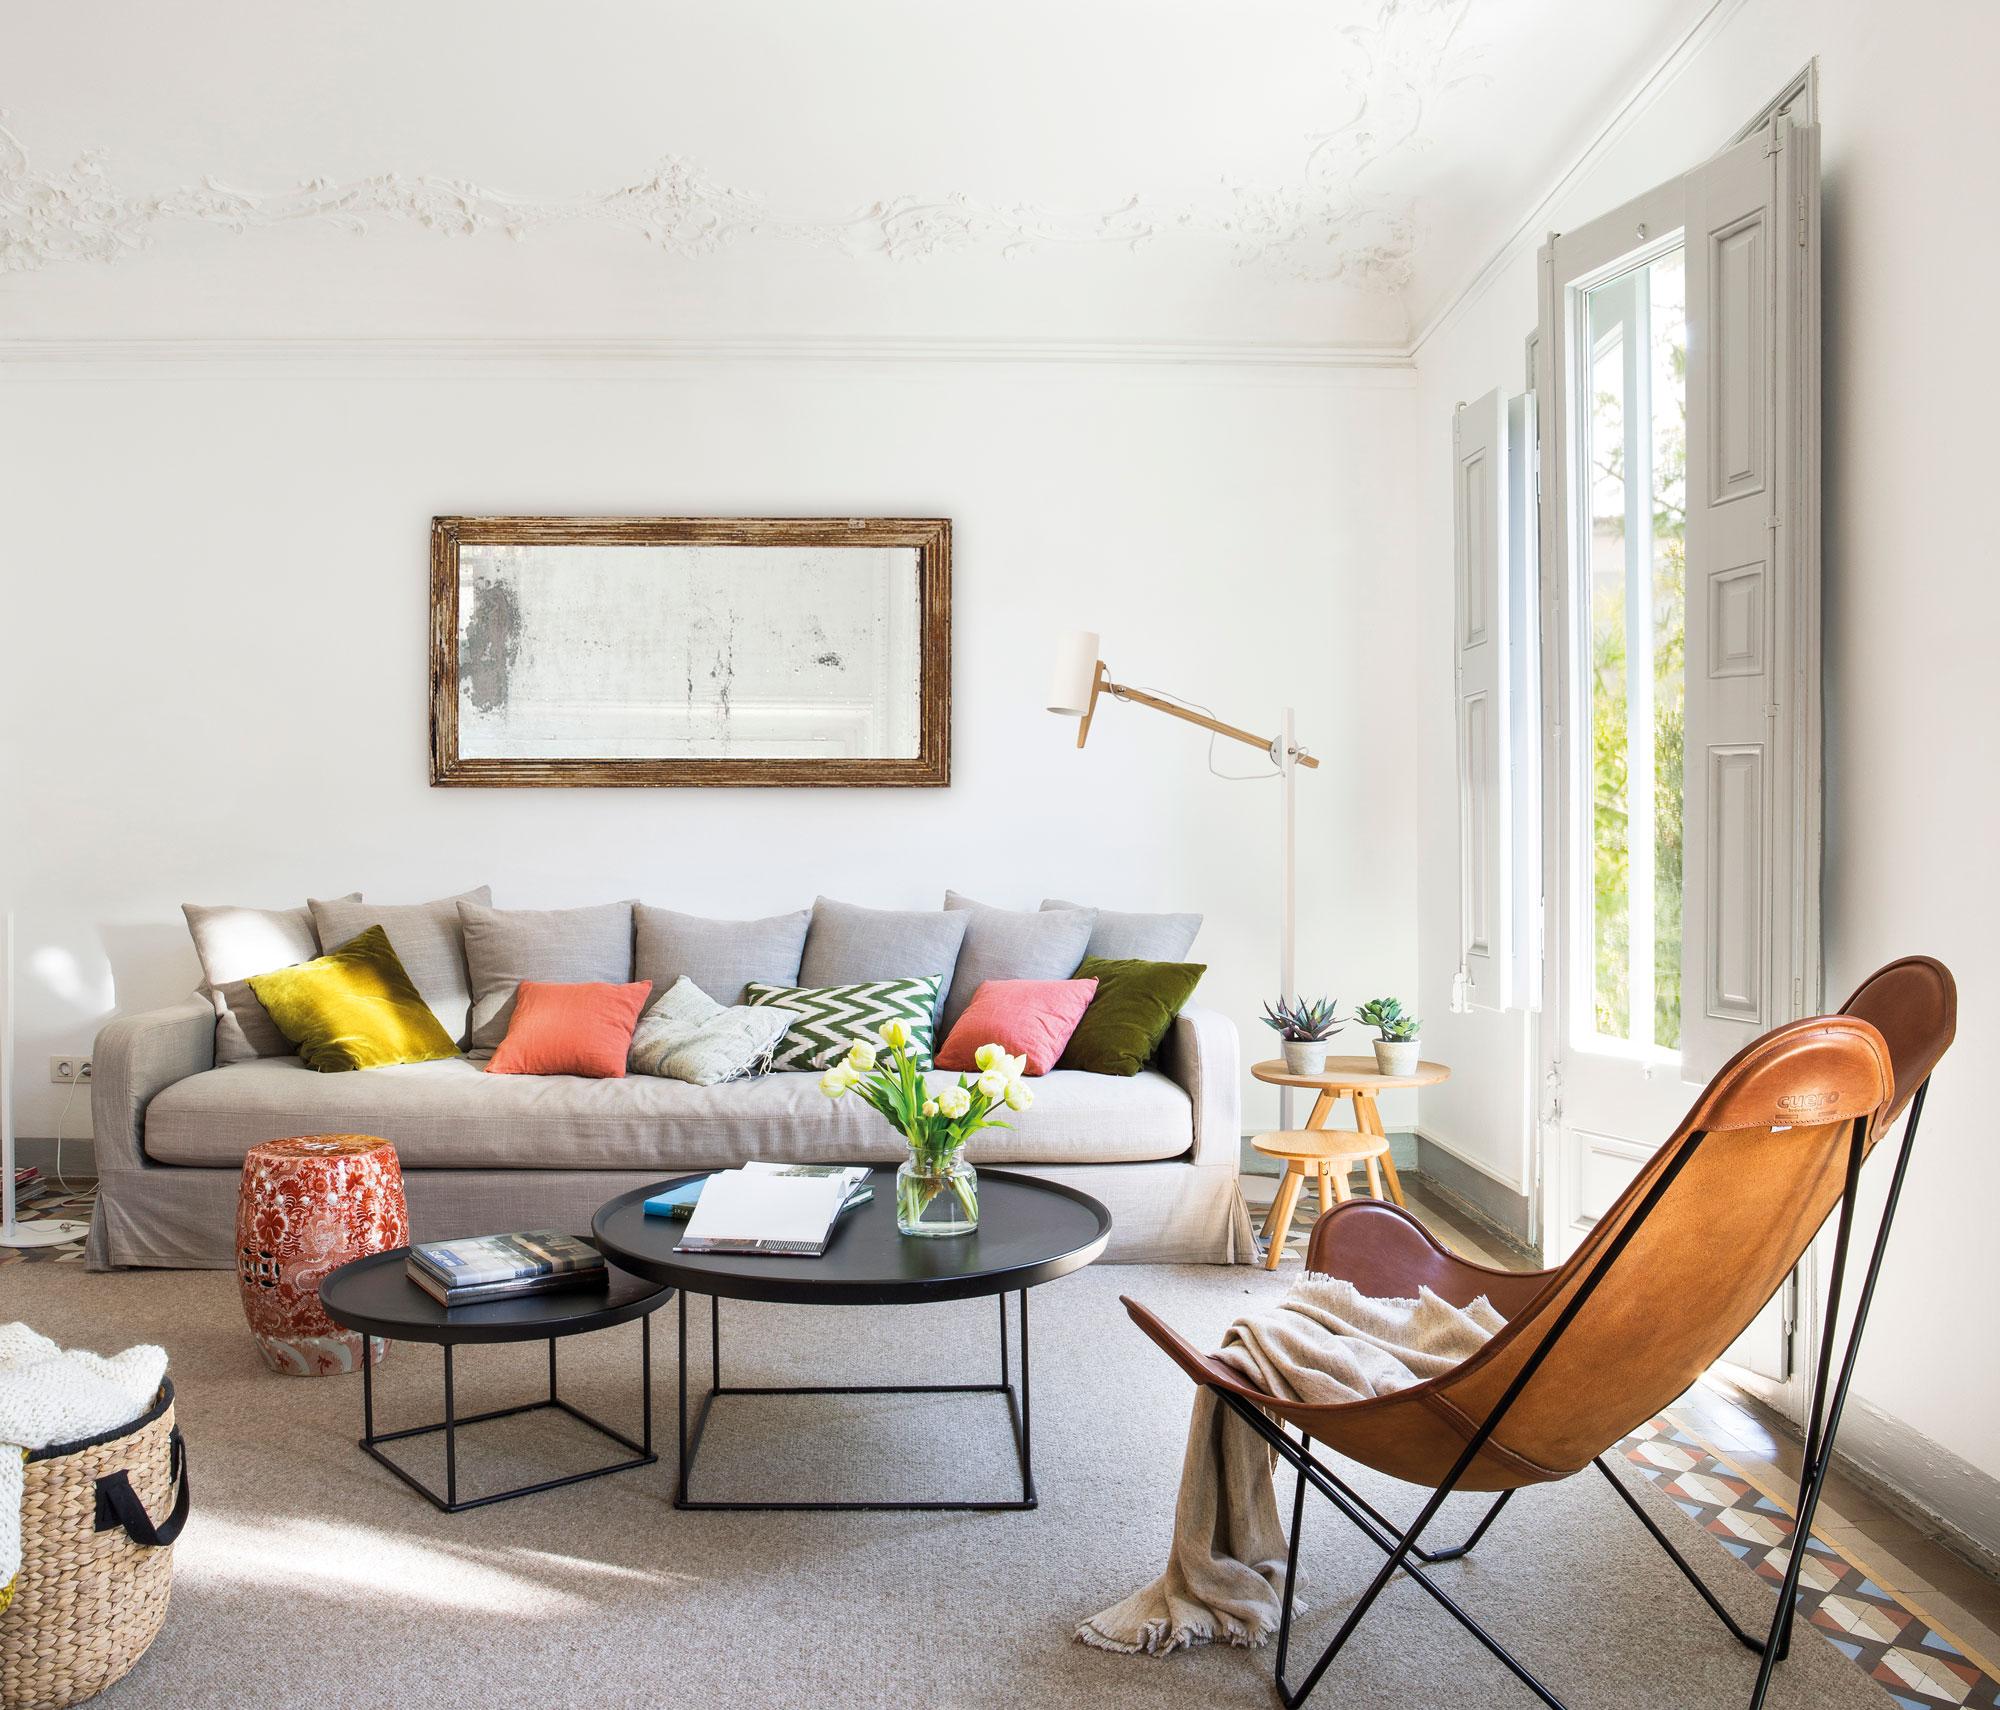 Muebles para espacios peque os - Sofas de diseno moderno ...